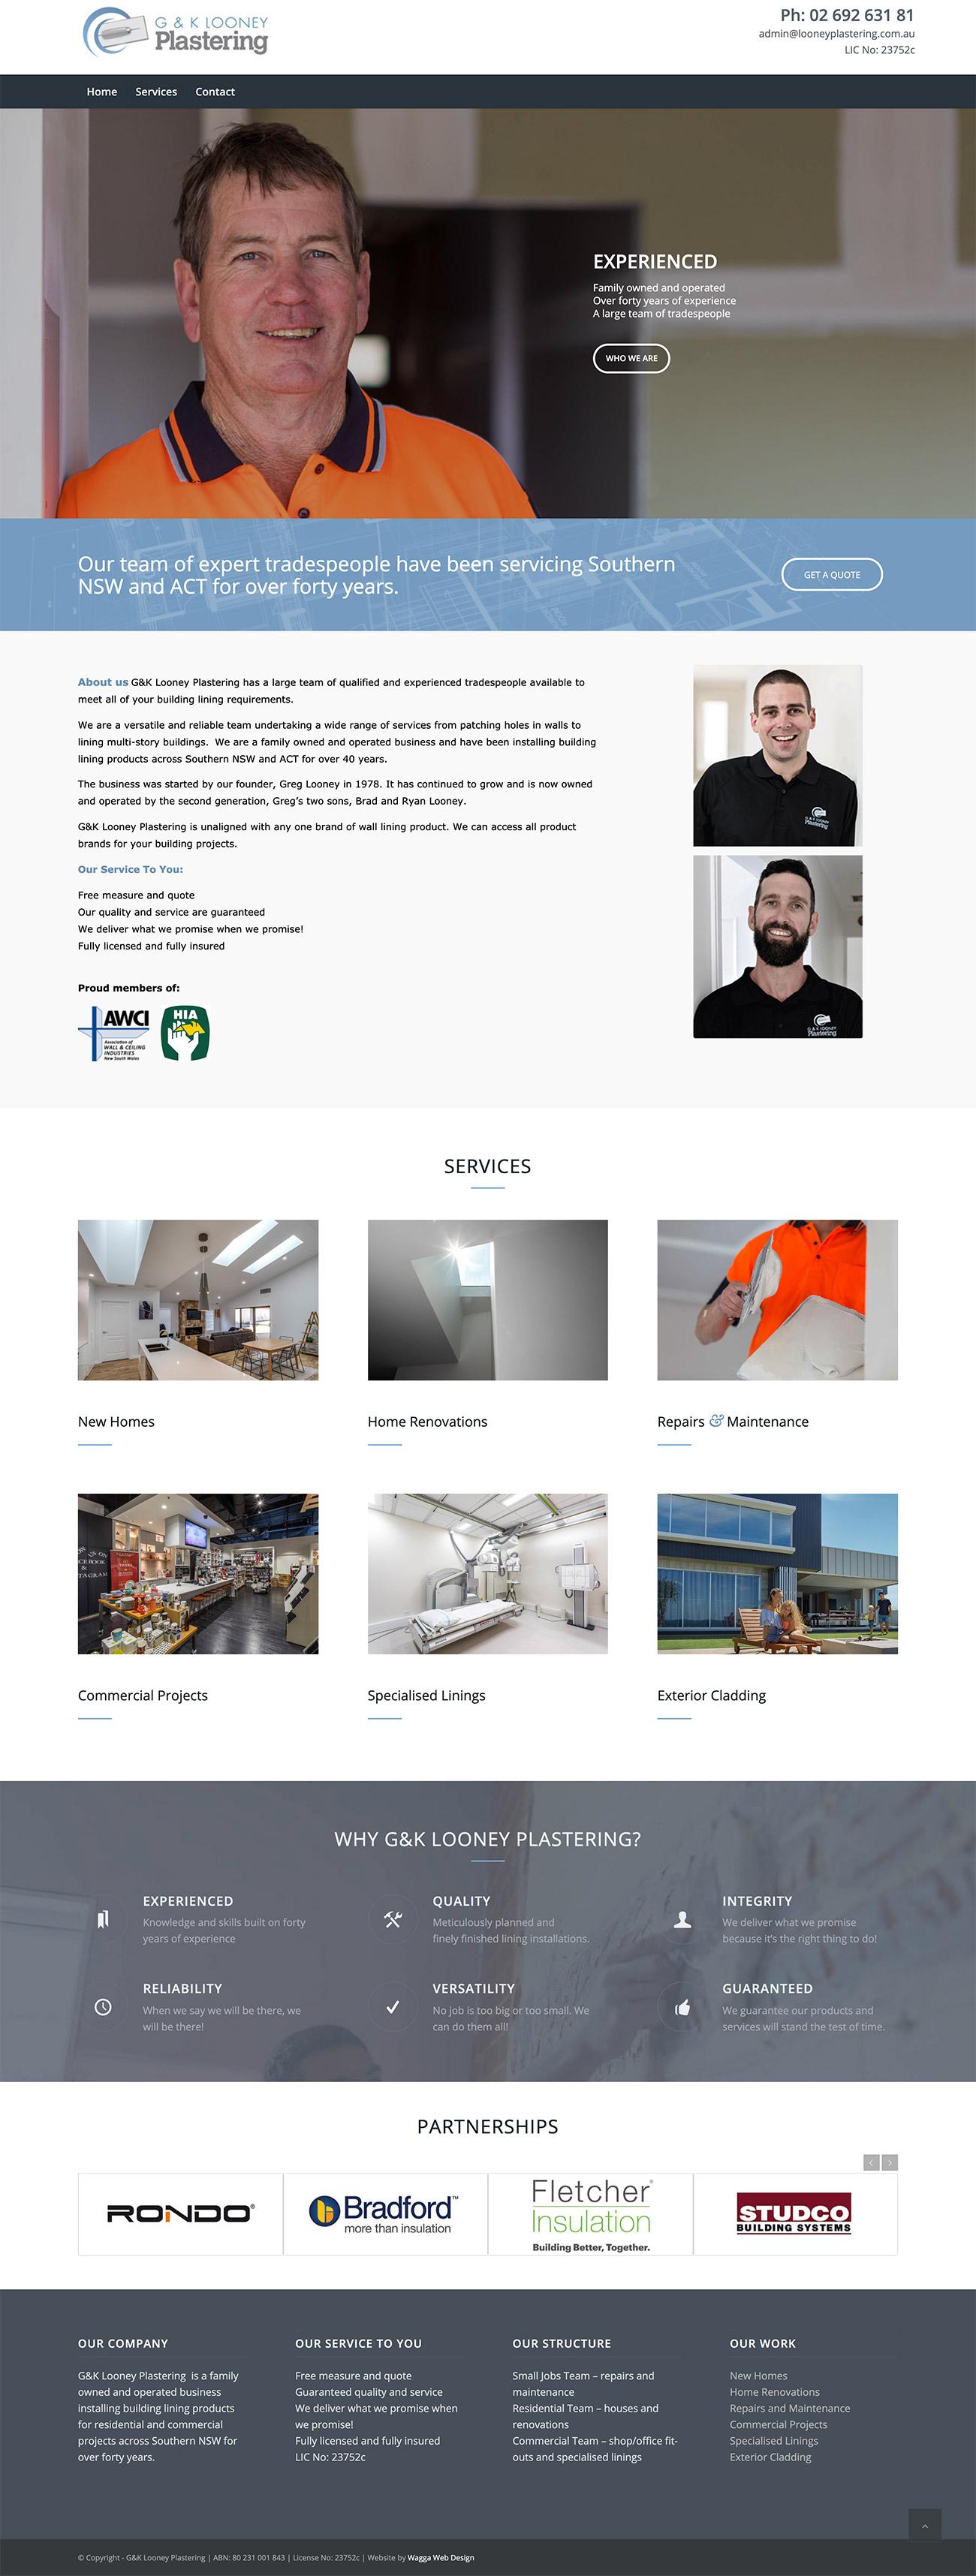 Plastering website